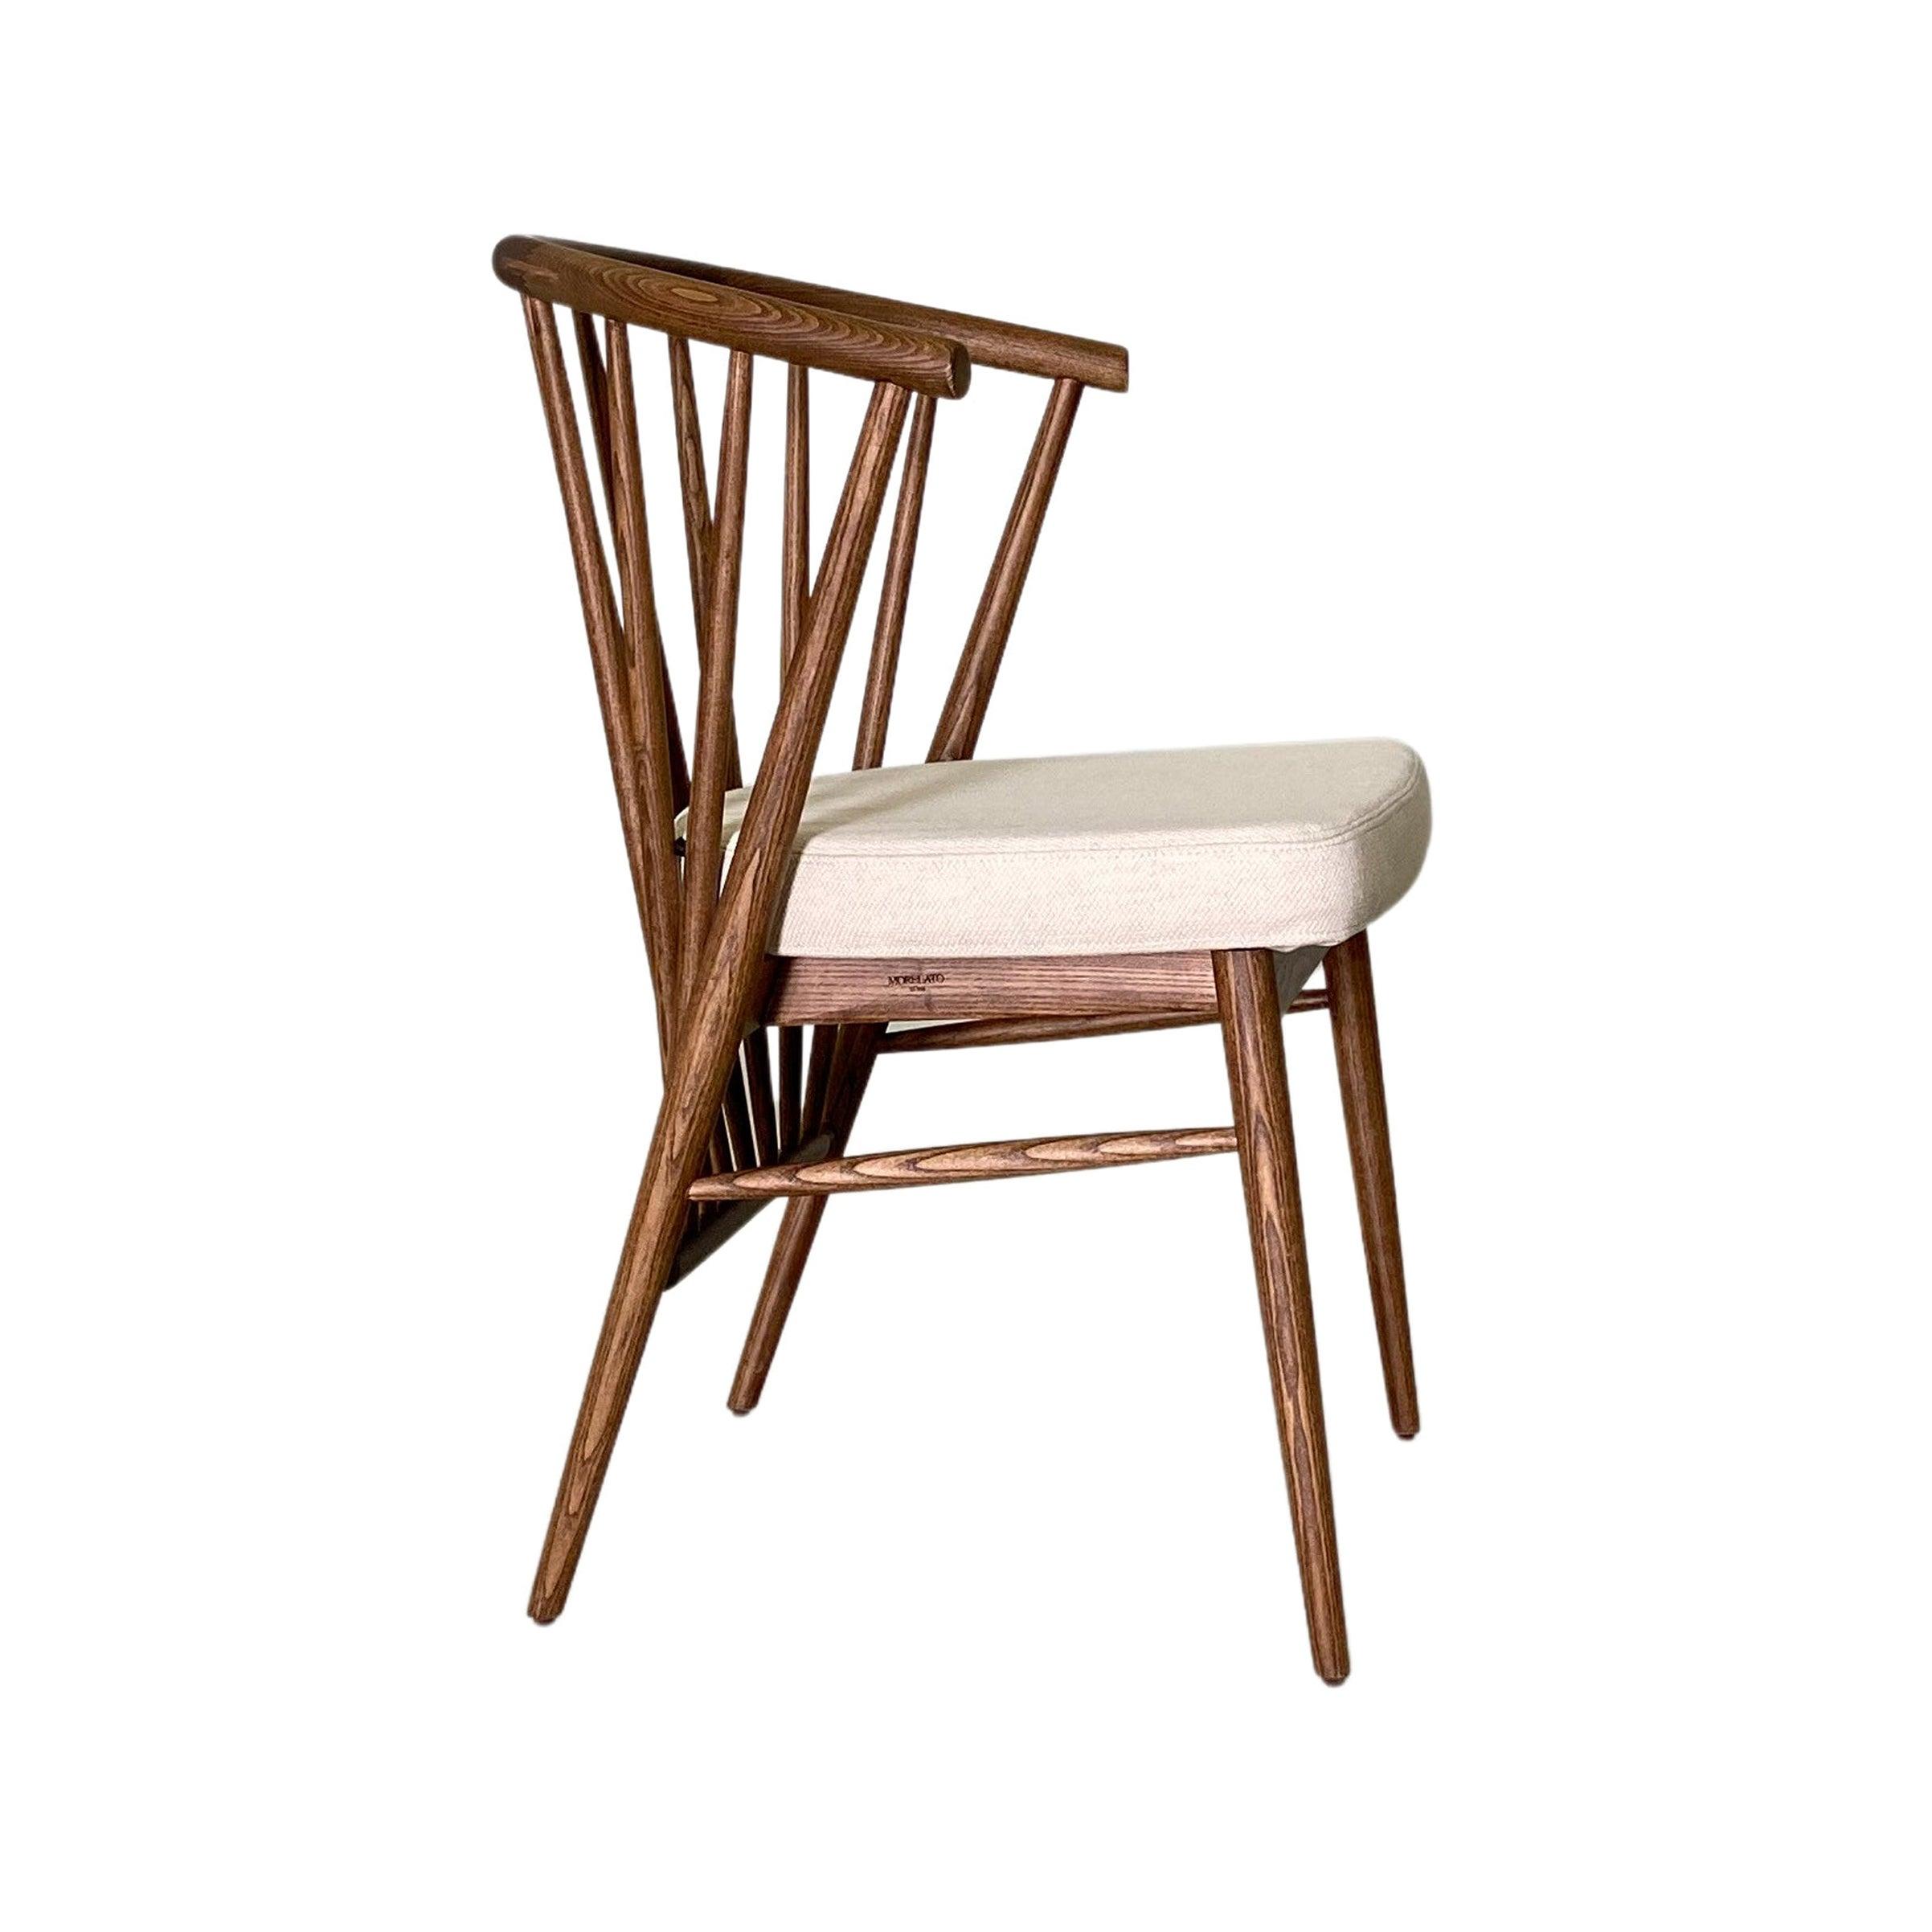 Morelato, Jenny Chair in Ash Wood